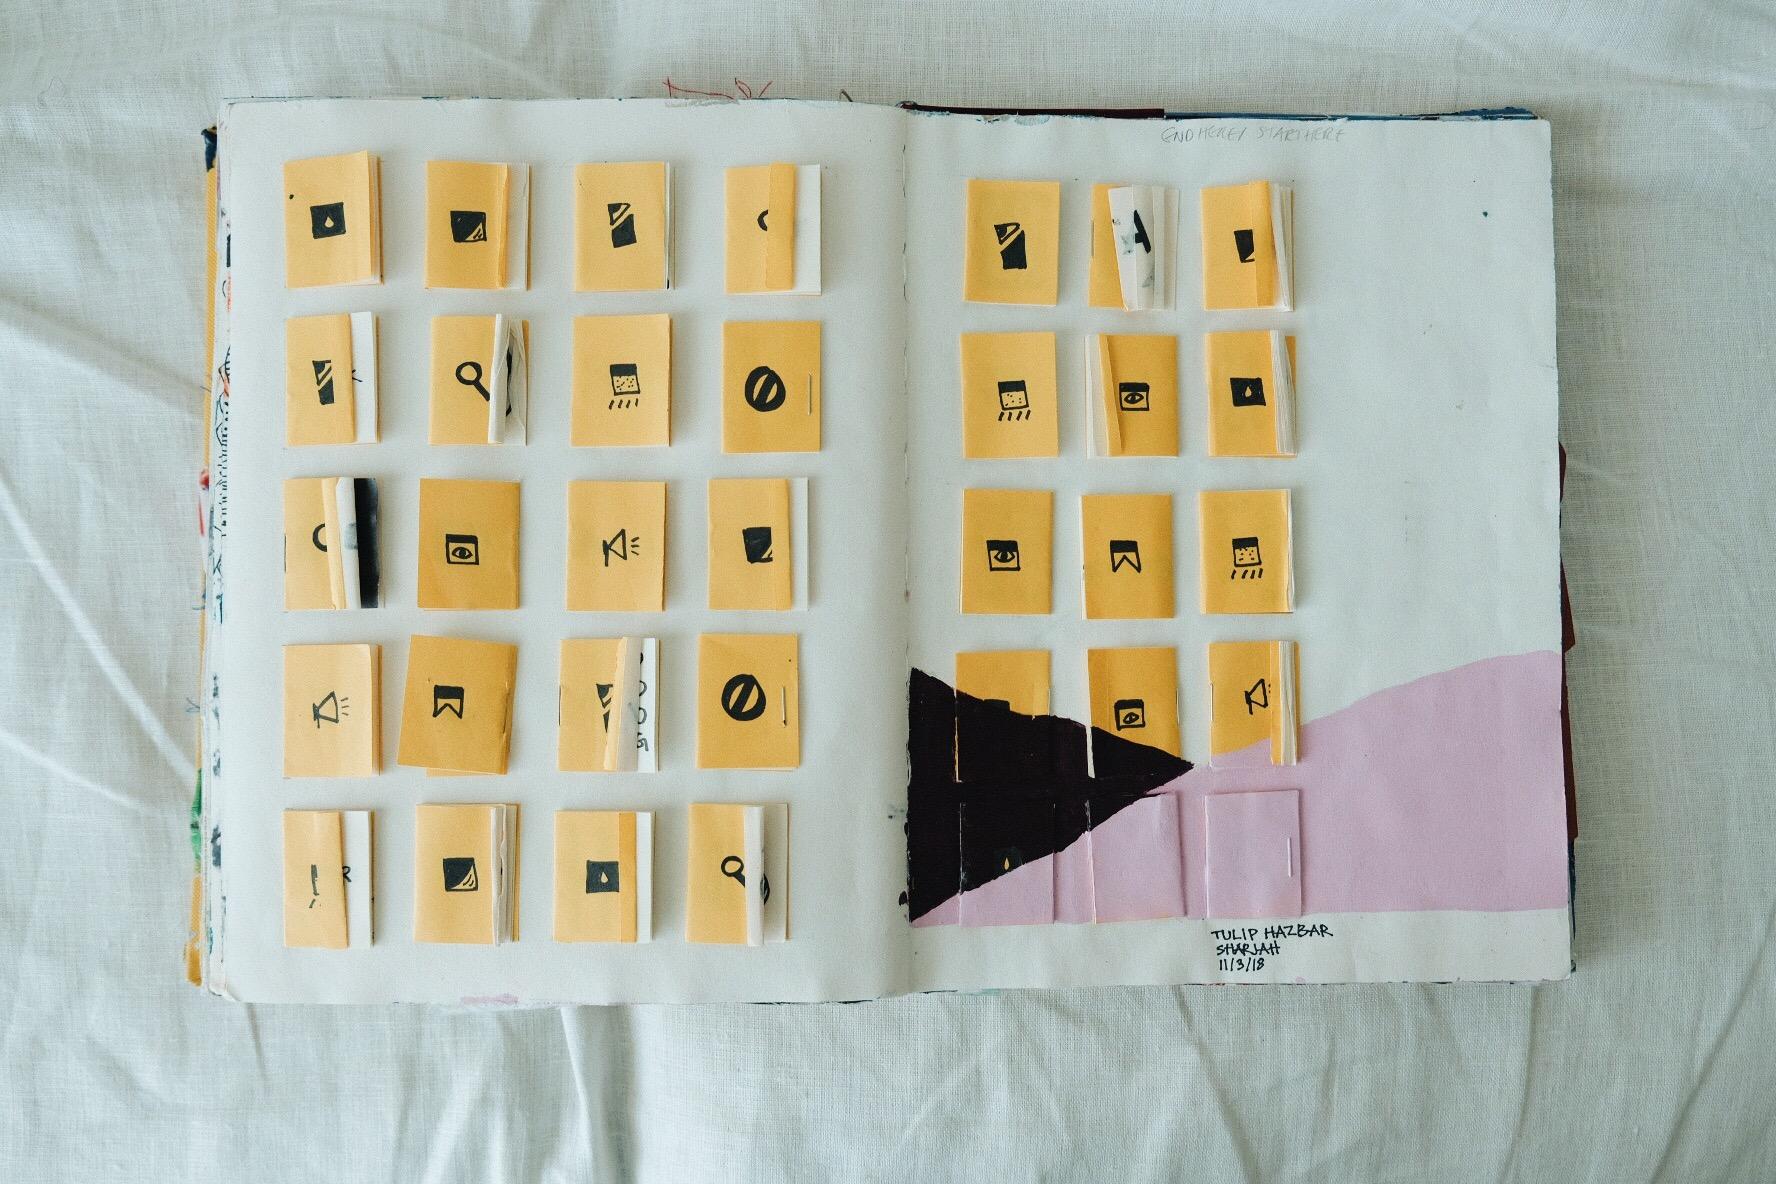 Work of Zain Mahjoub intersects with Tulip Hazbar